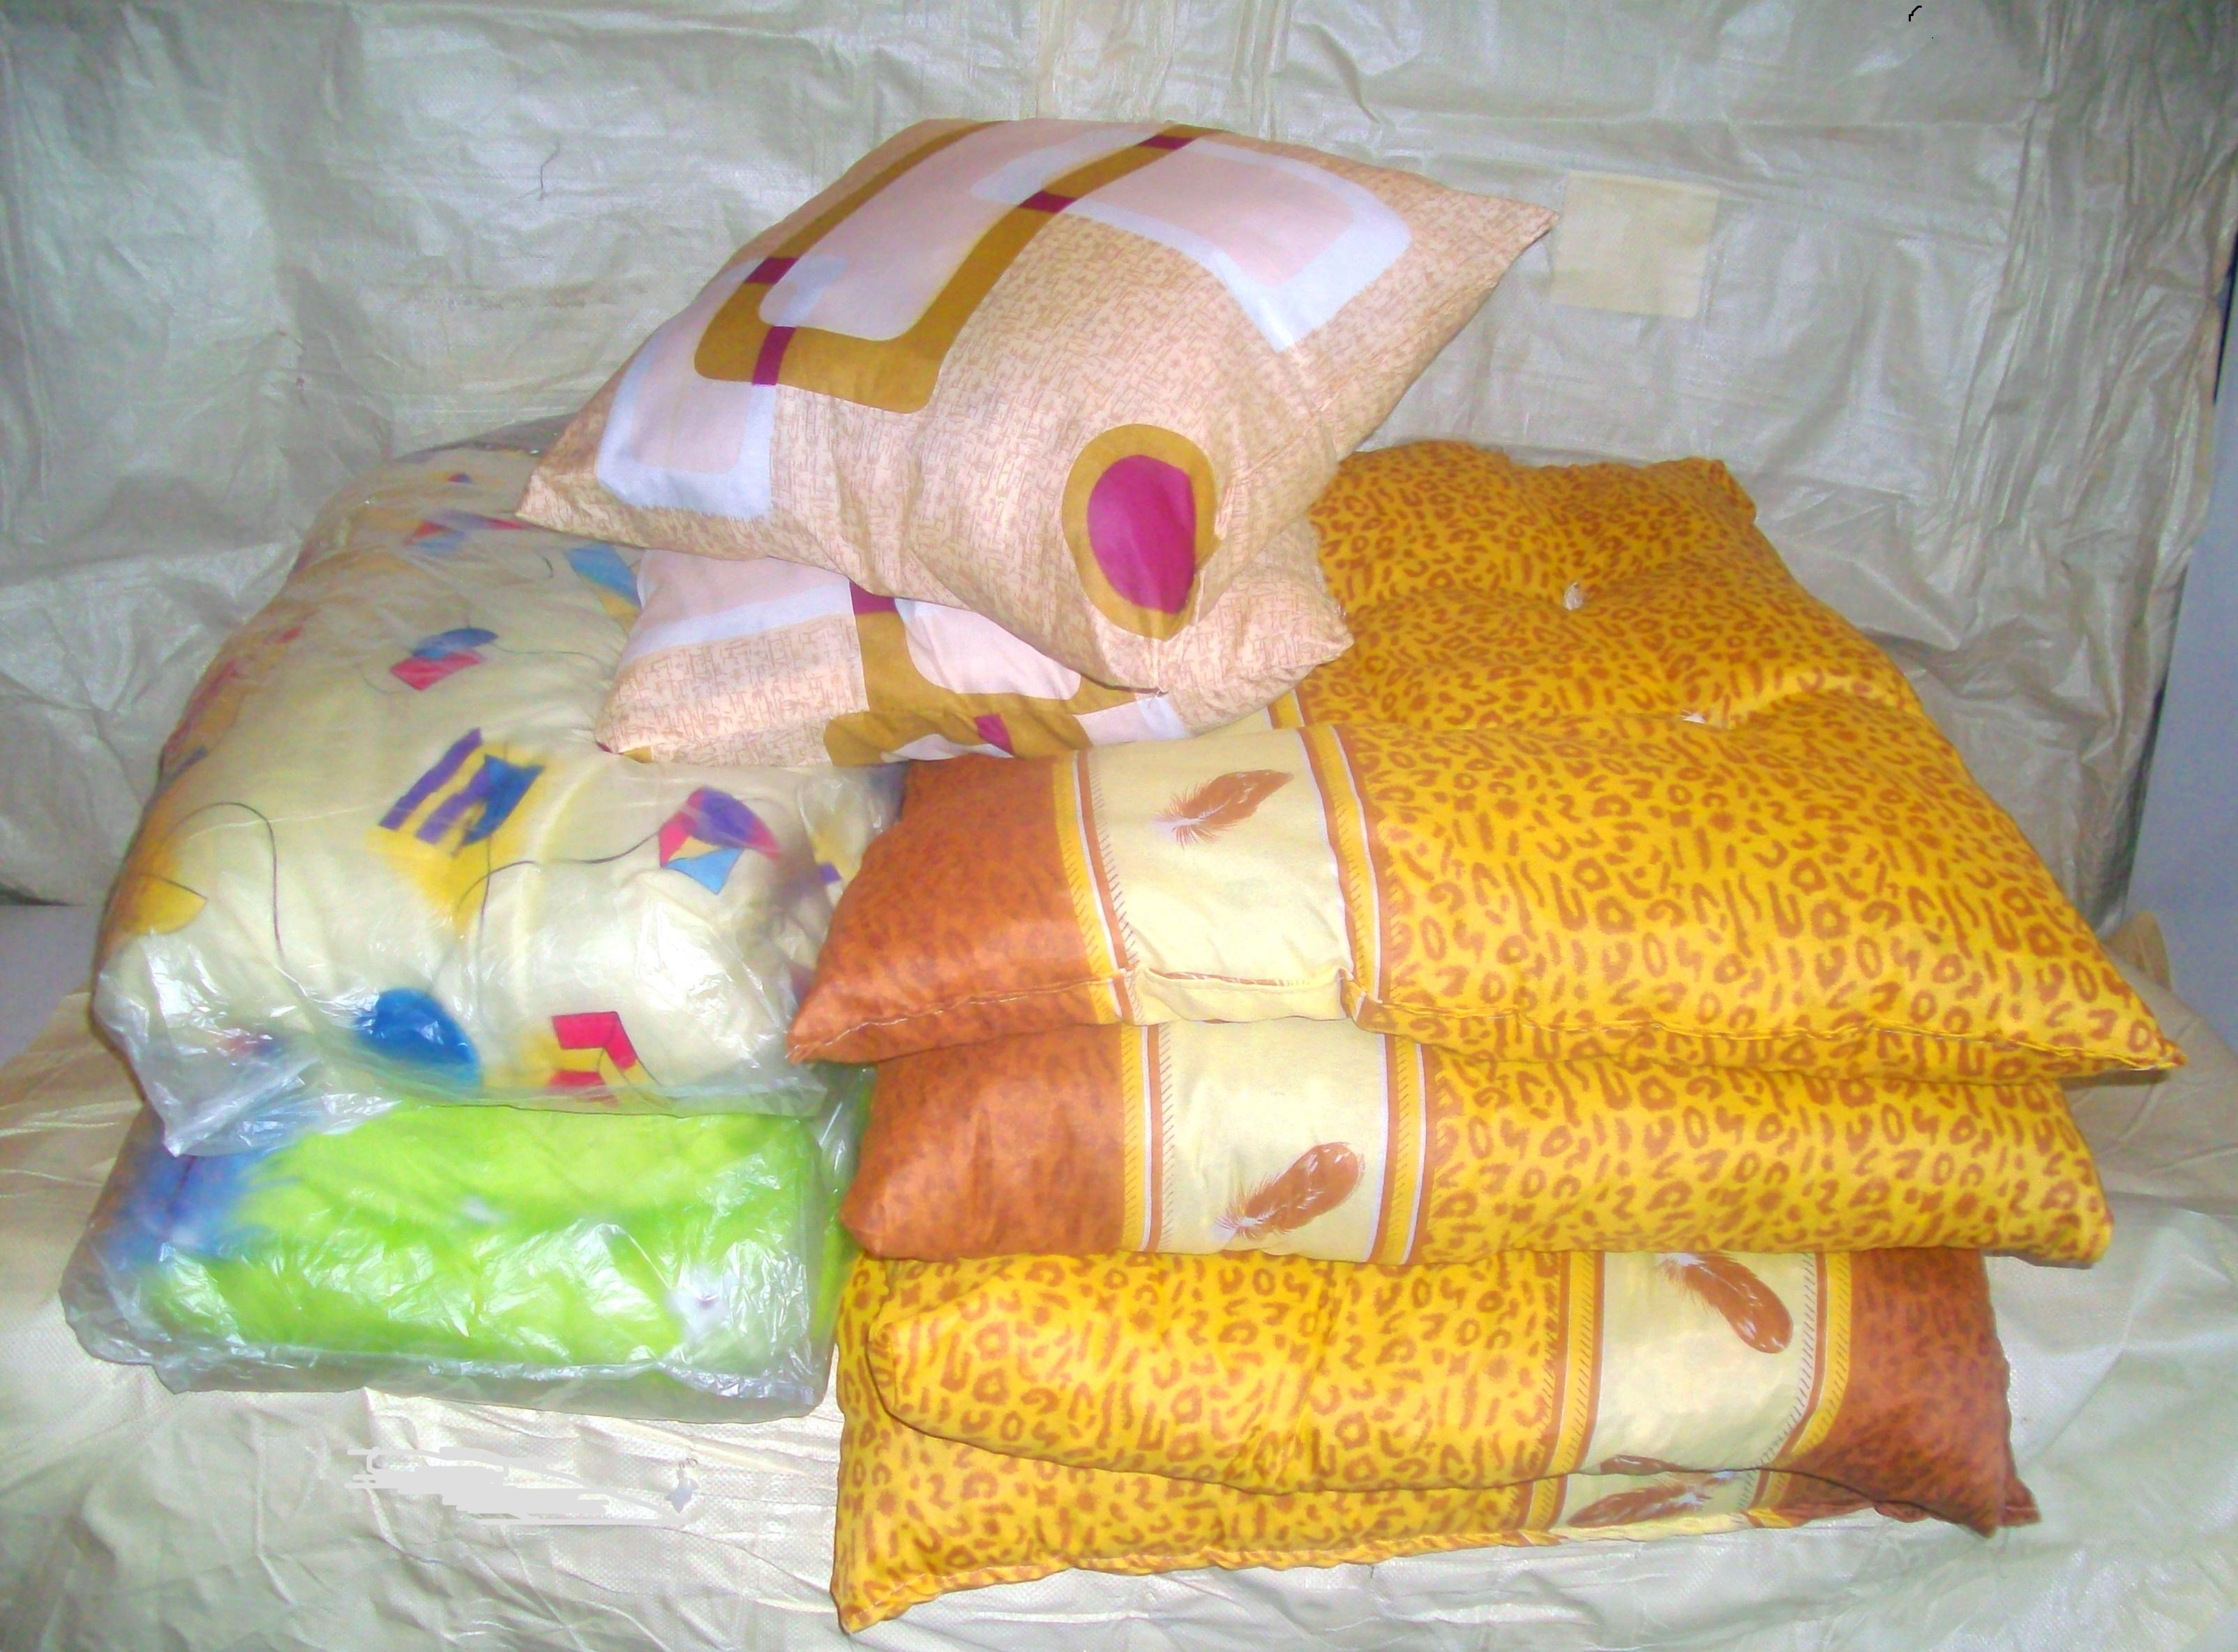 Матрас и подушки